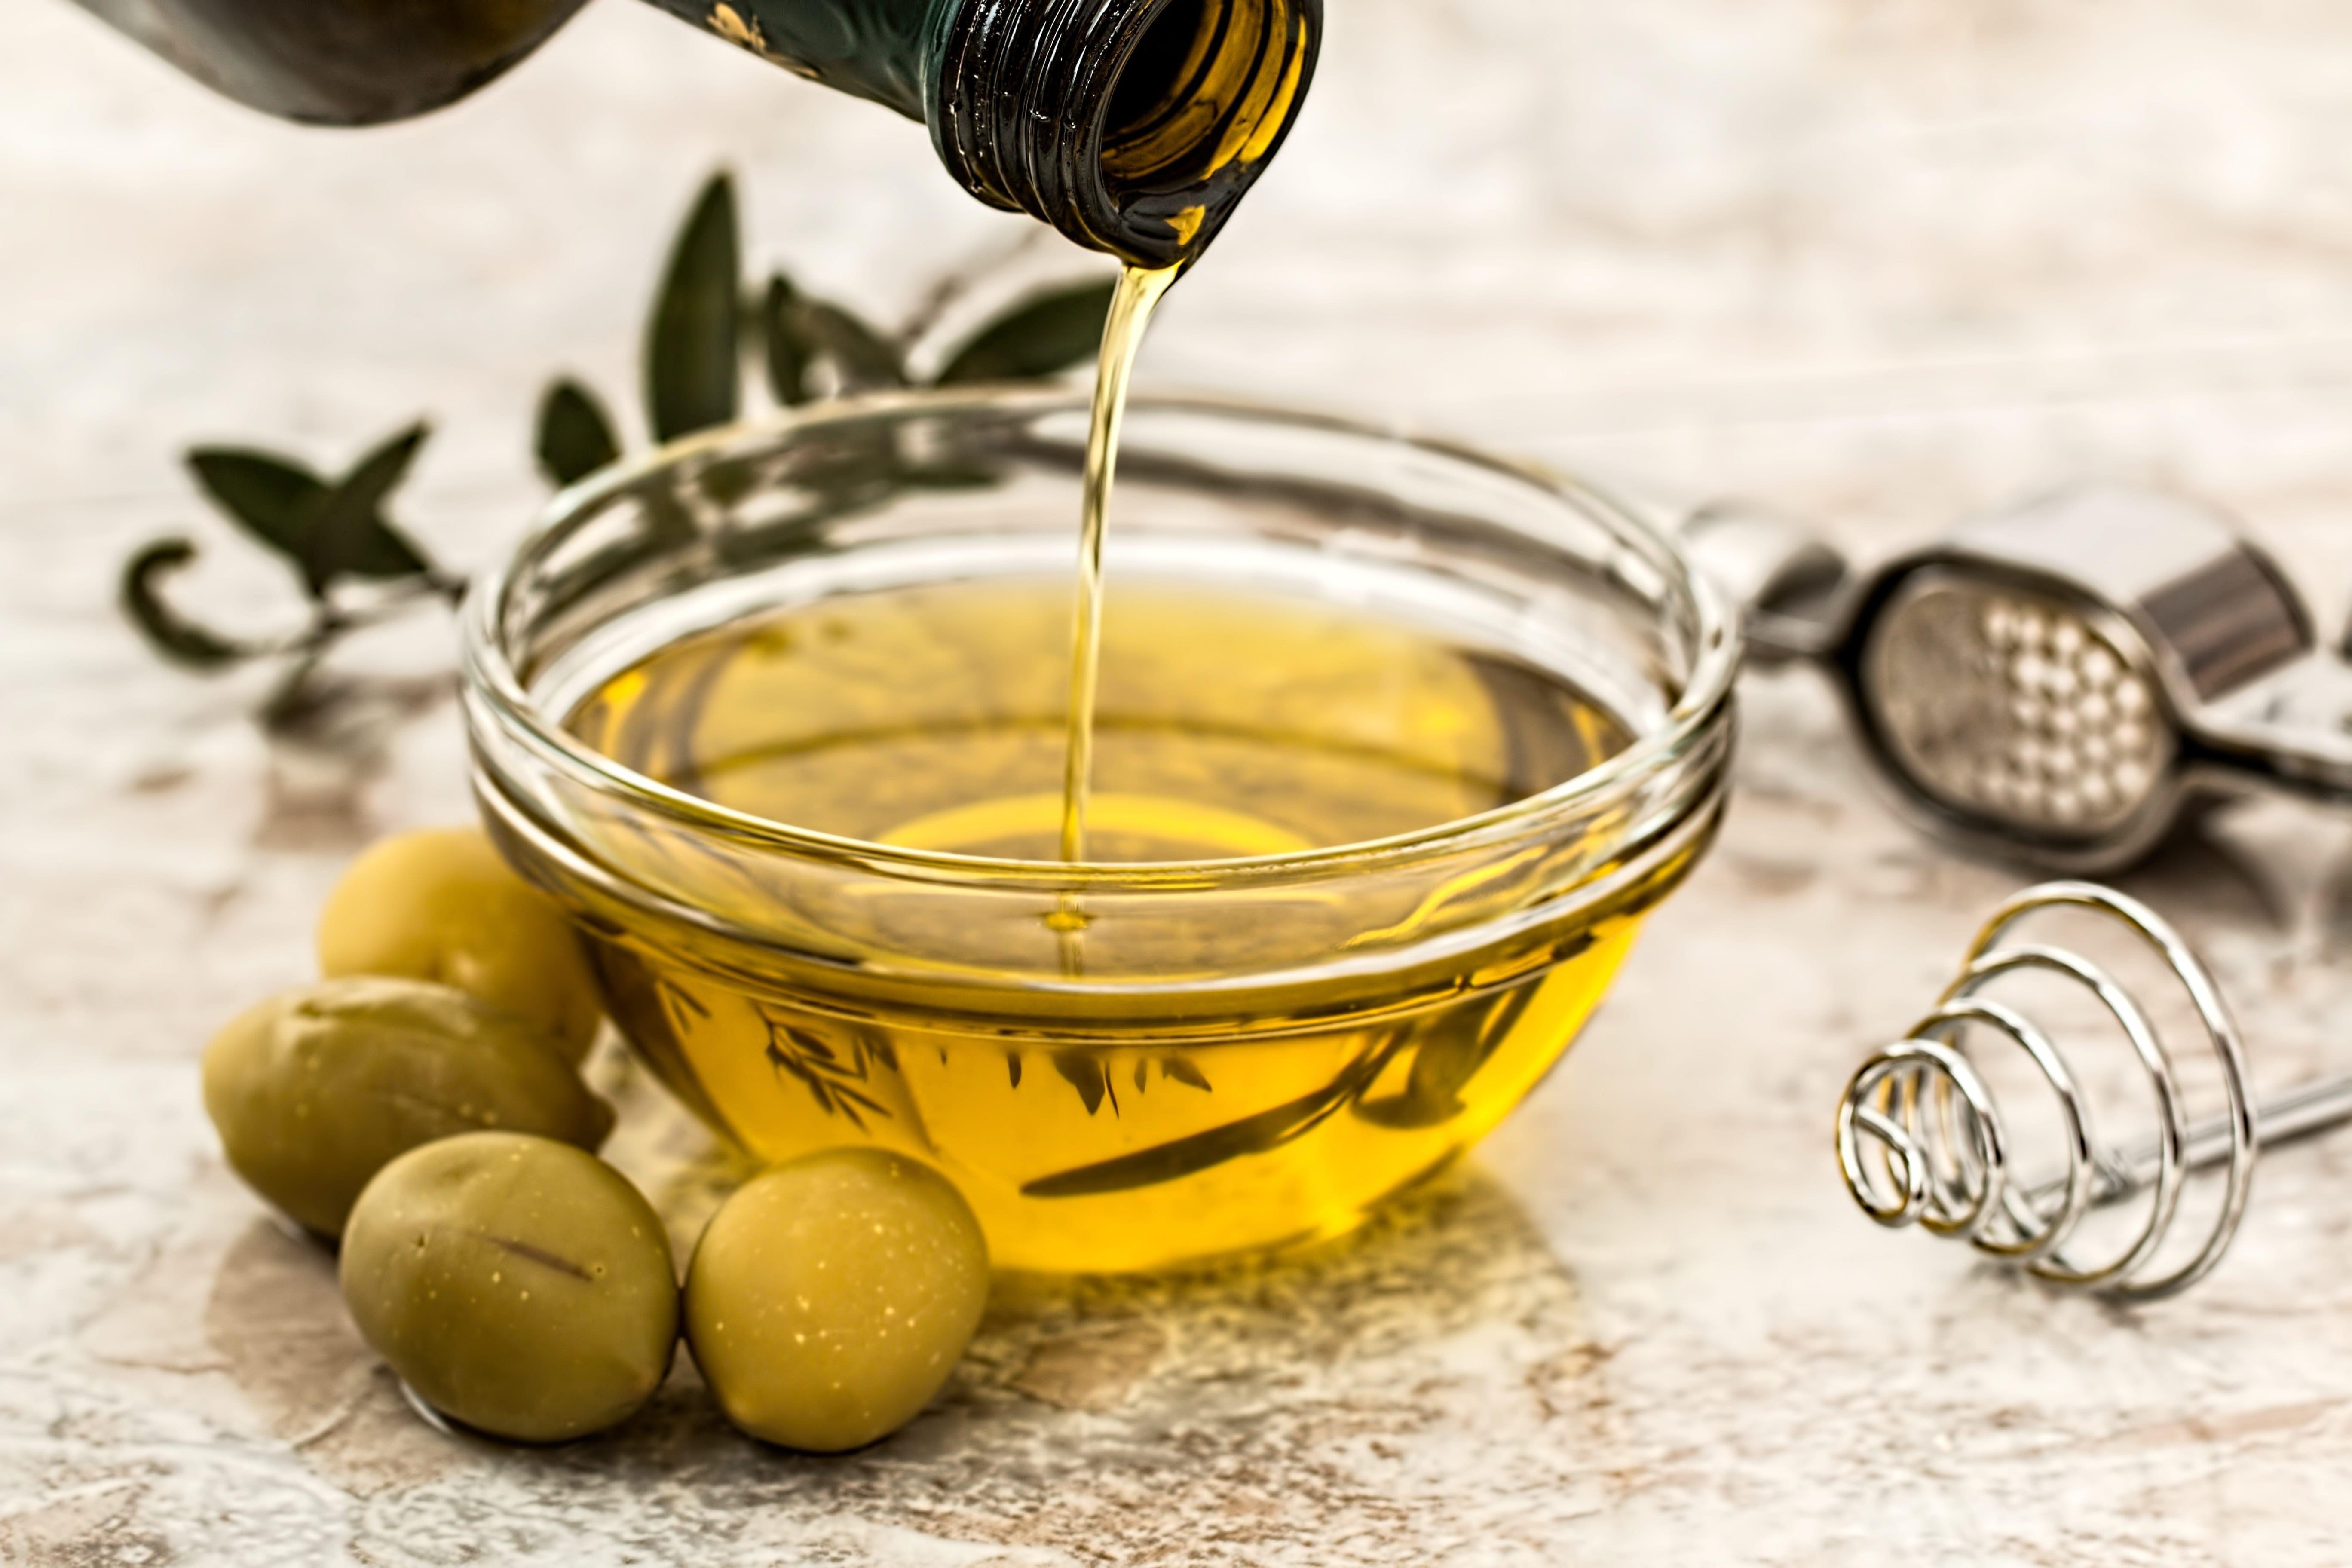 Butter/Oils - Keto Friendly Foods